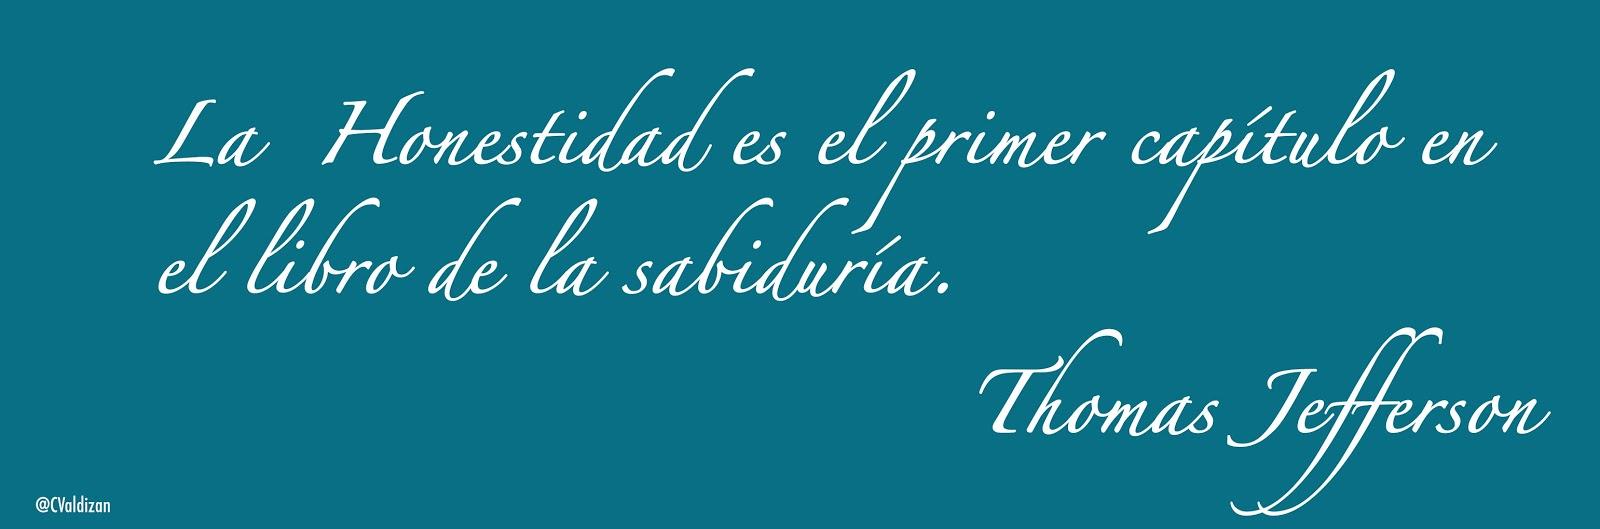 Honestidad - Thomas Jefferson